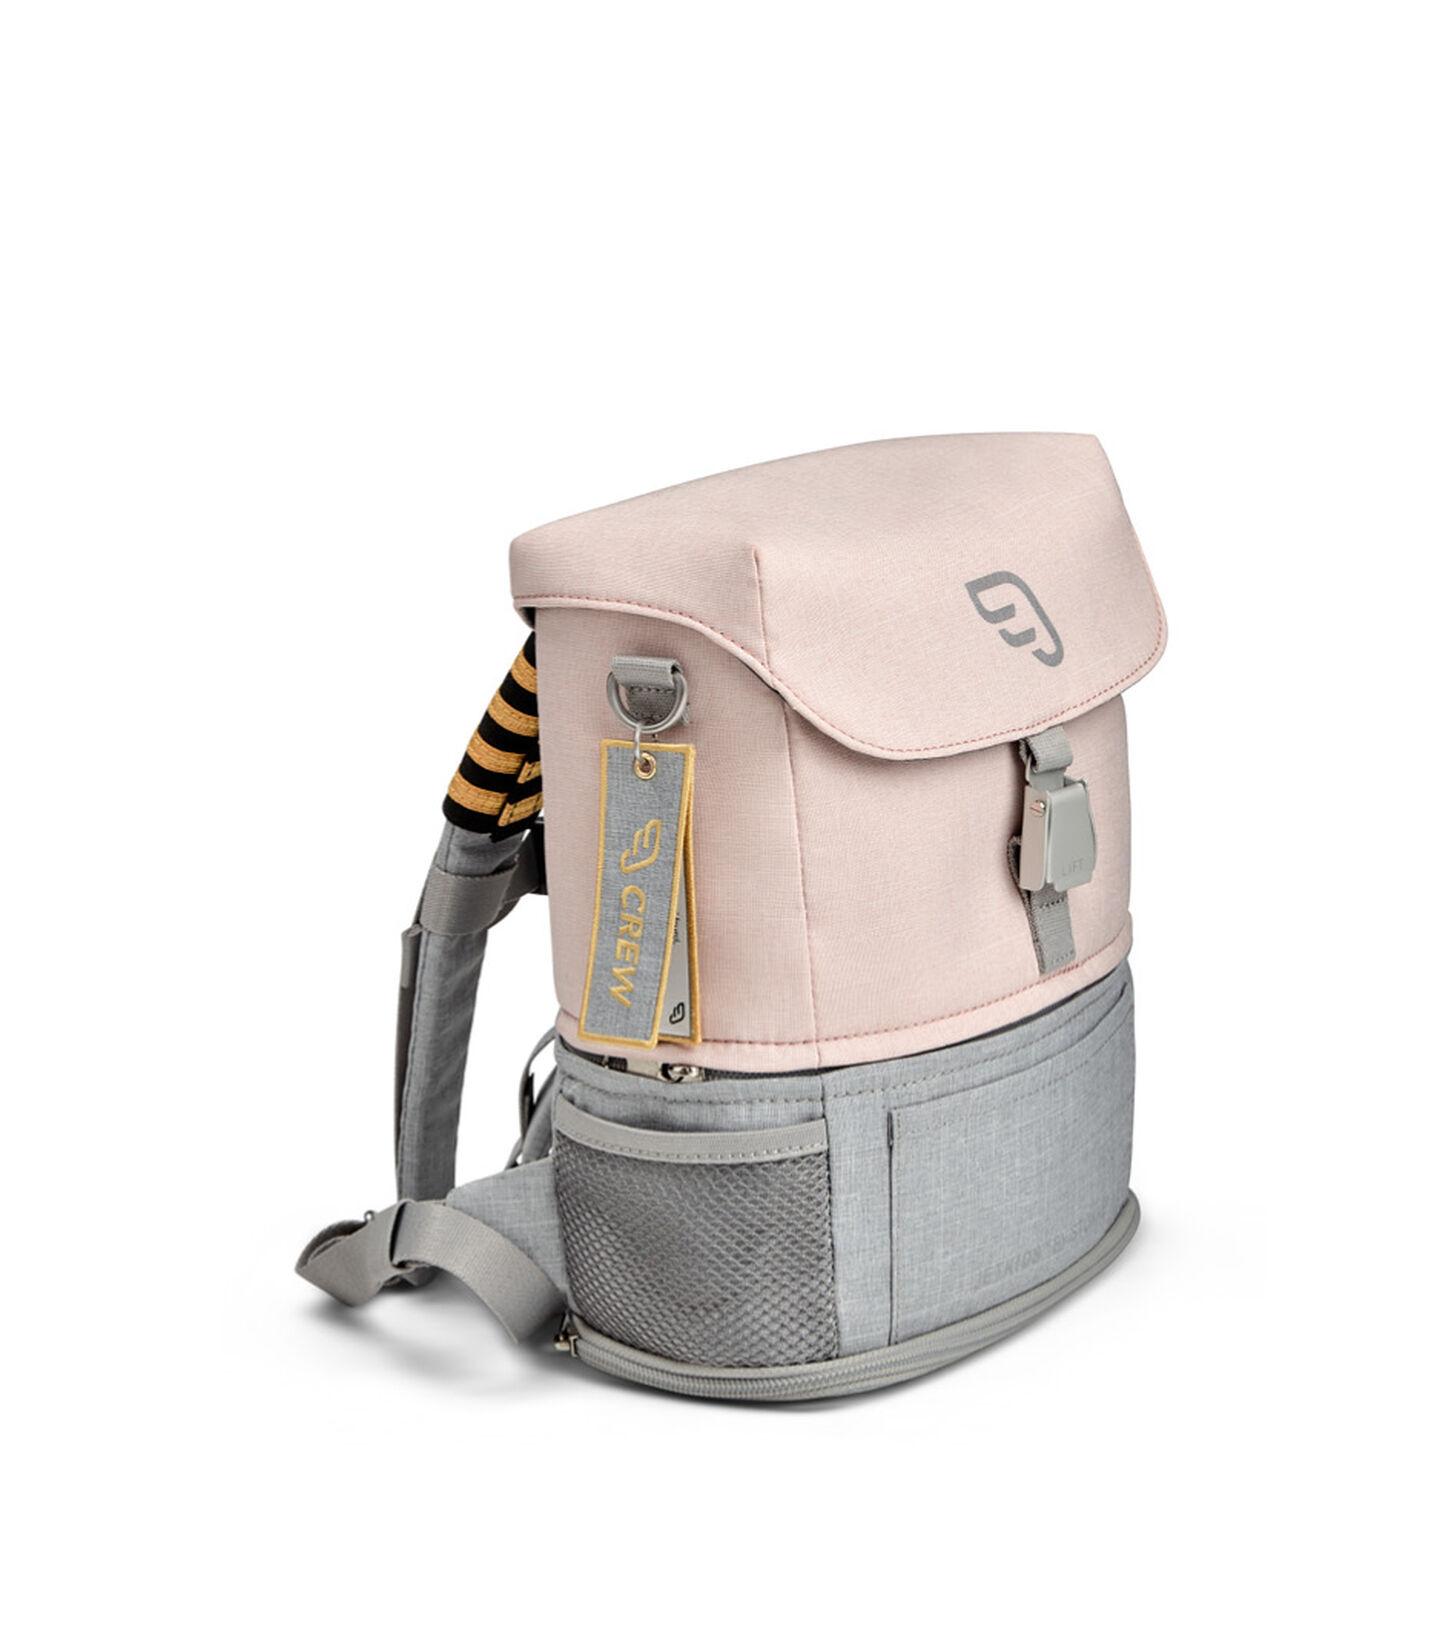 JETKIDS Crew Backpack Pink Lemonade, Pink Lemonade, mainview